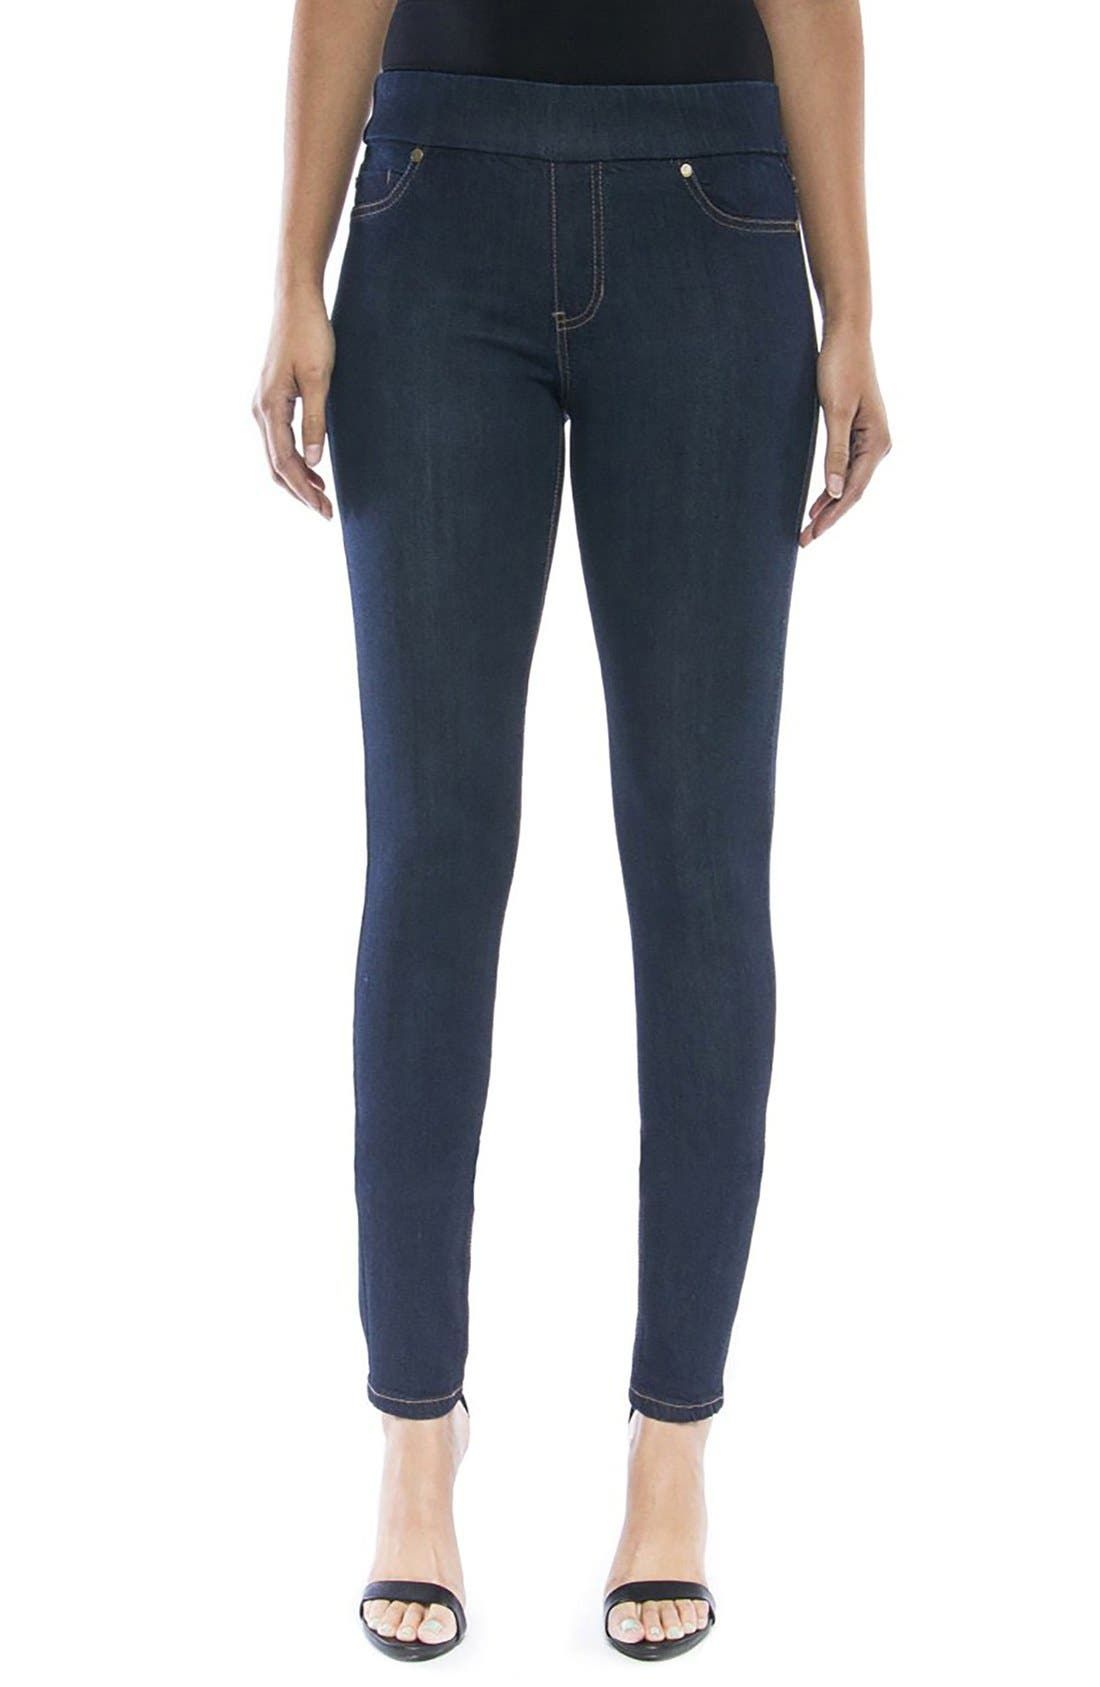 Jeans Company Sienna Mid Rise Soft Stretch Denim Leggings,                         Main,                         color, INDIGO RINSE